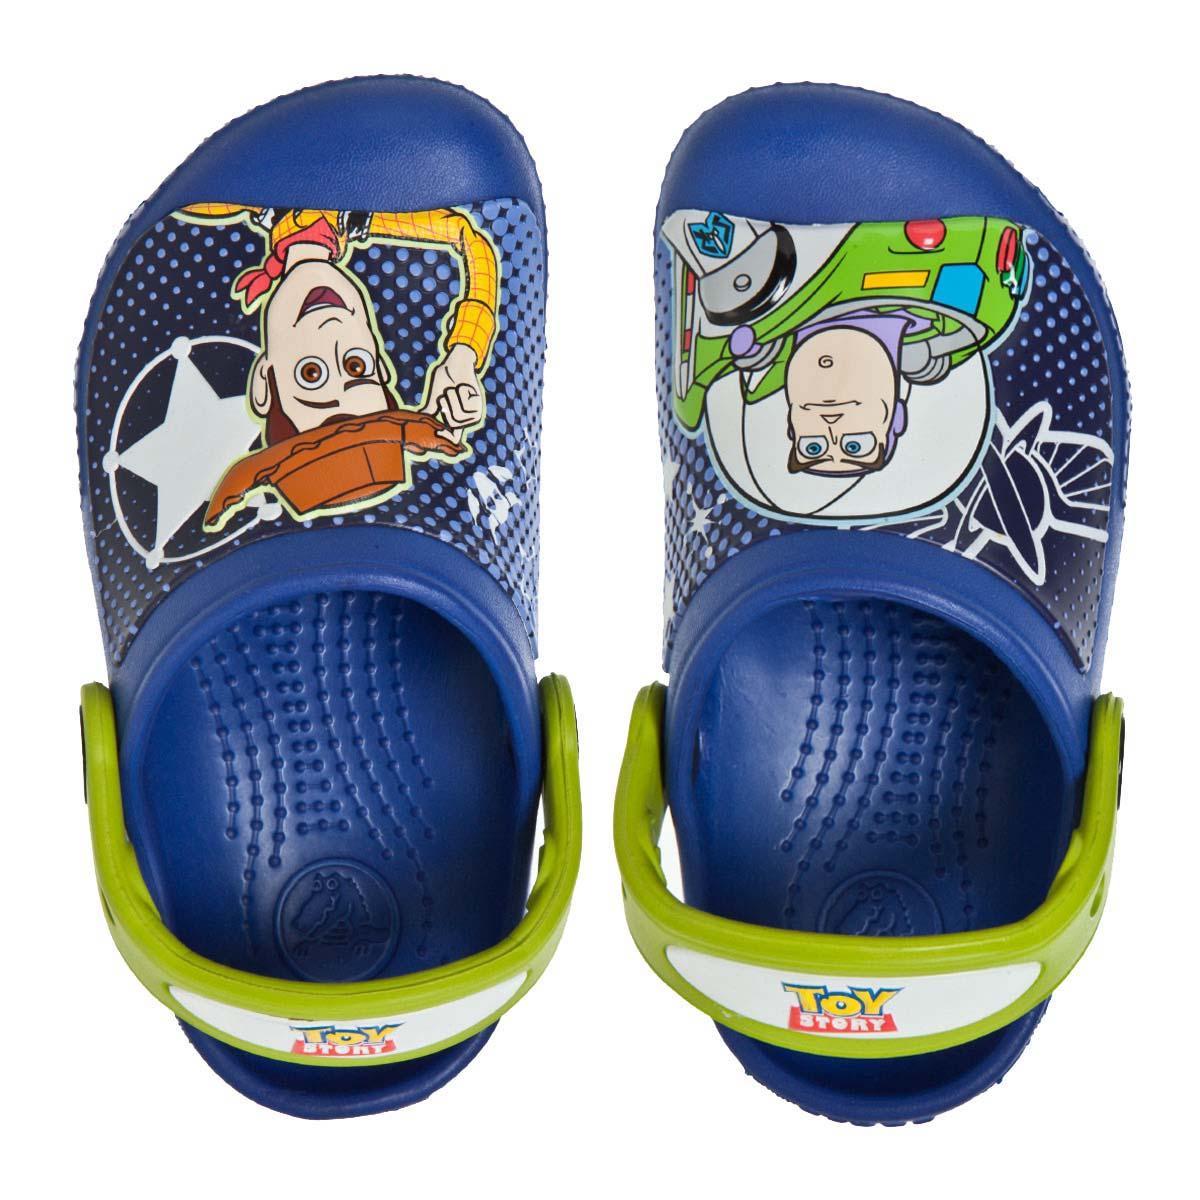 Crocs Cc Woody Amp Buzz Kids Clog Cerulean Blue Online At